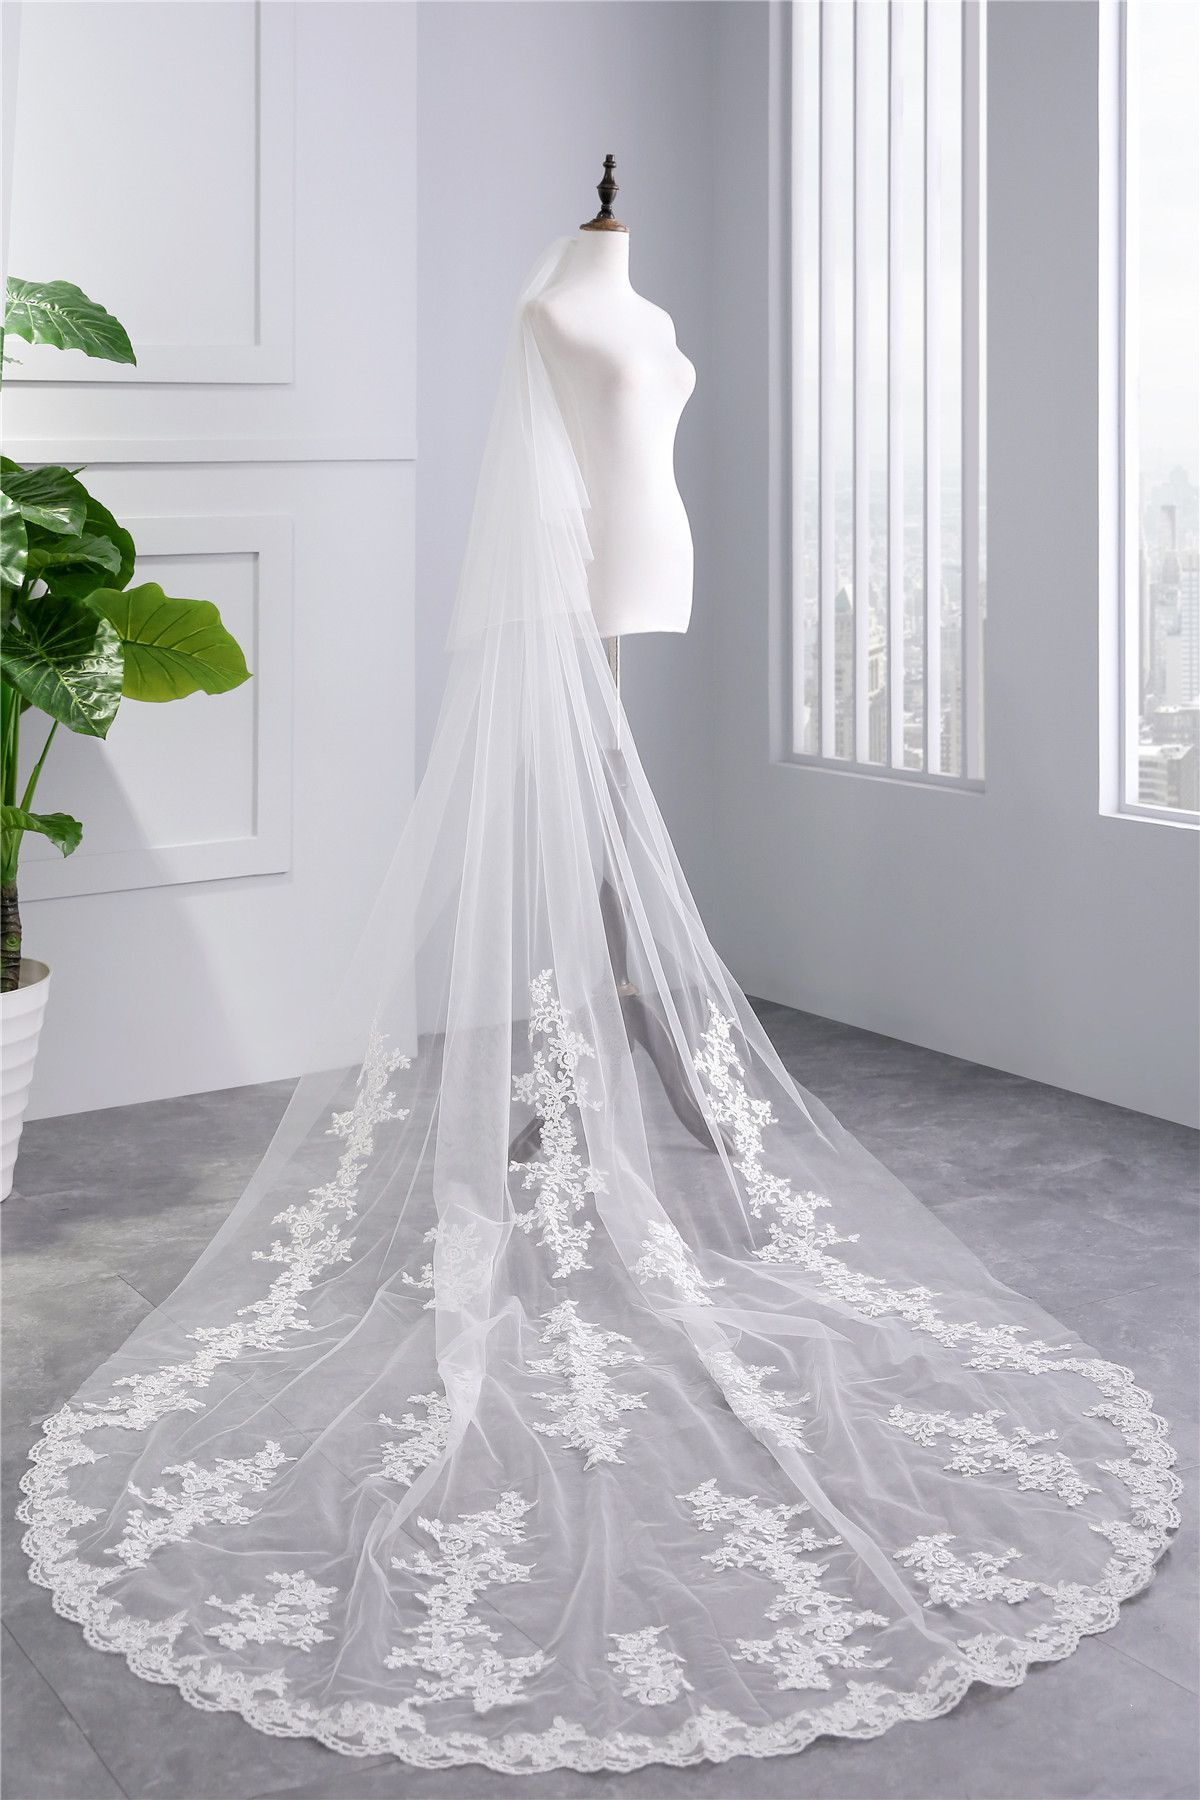 Cathedral Tulle Lace Wedding Veil Bridal Veil From Onlyforbrides Bridal Veil Wedding Veils Lace Long Lace Veil [ 1800 x 1200 Pixel ]